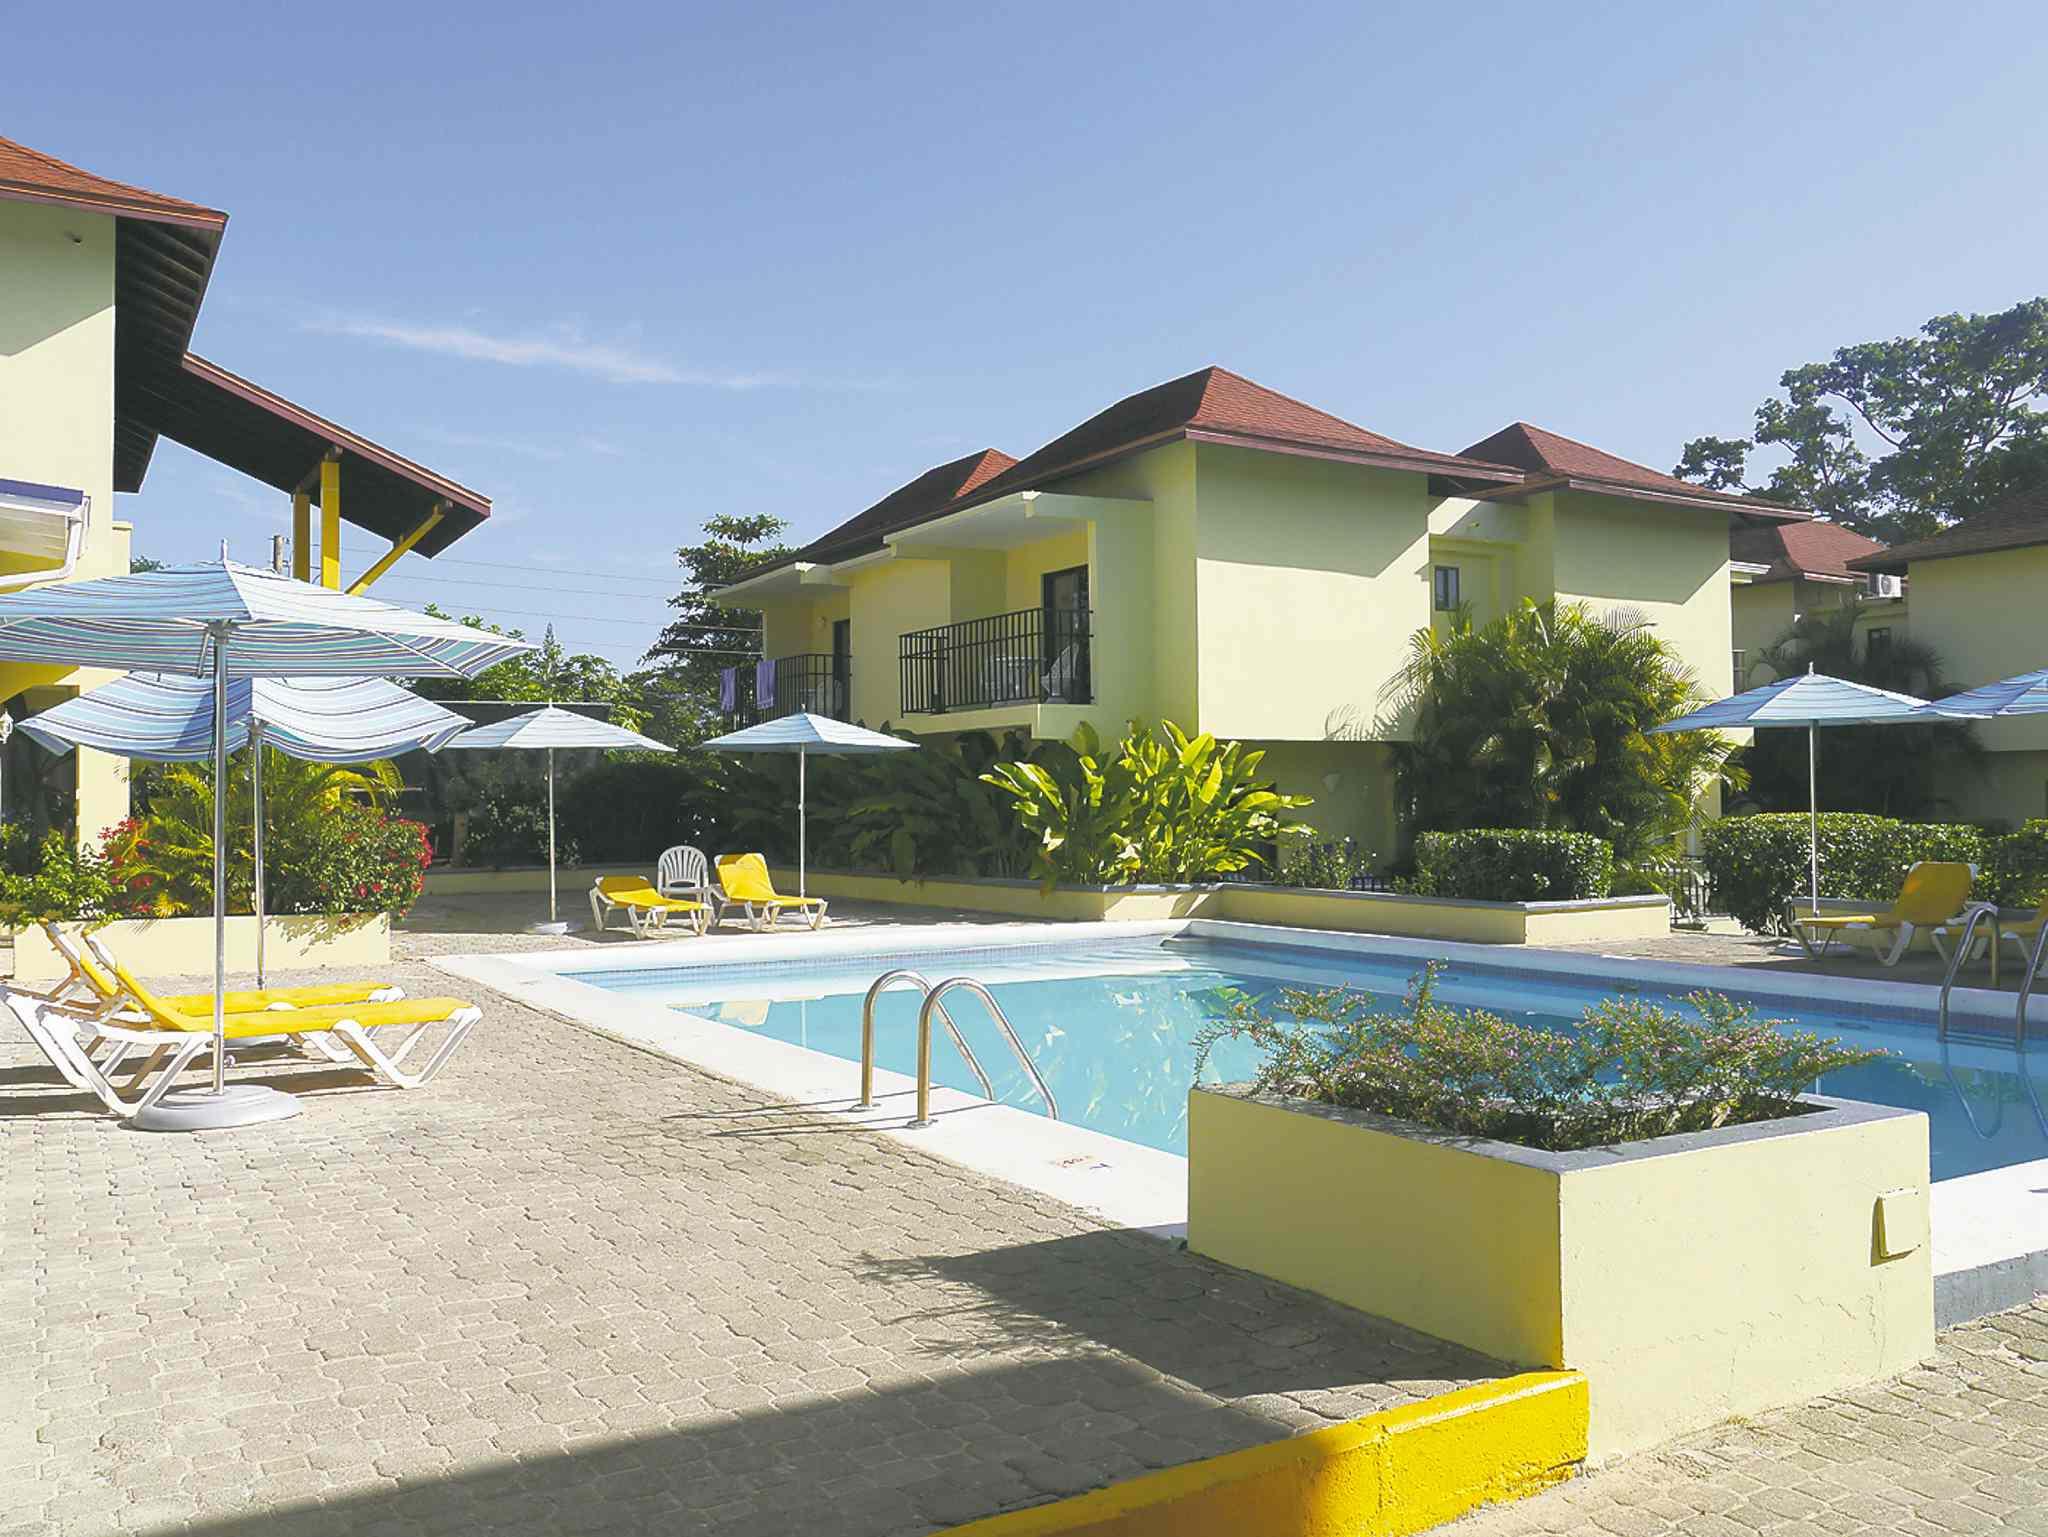 Bedroom Apartment Hotel Rooms In Negril Jamaica